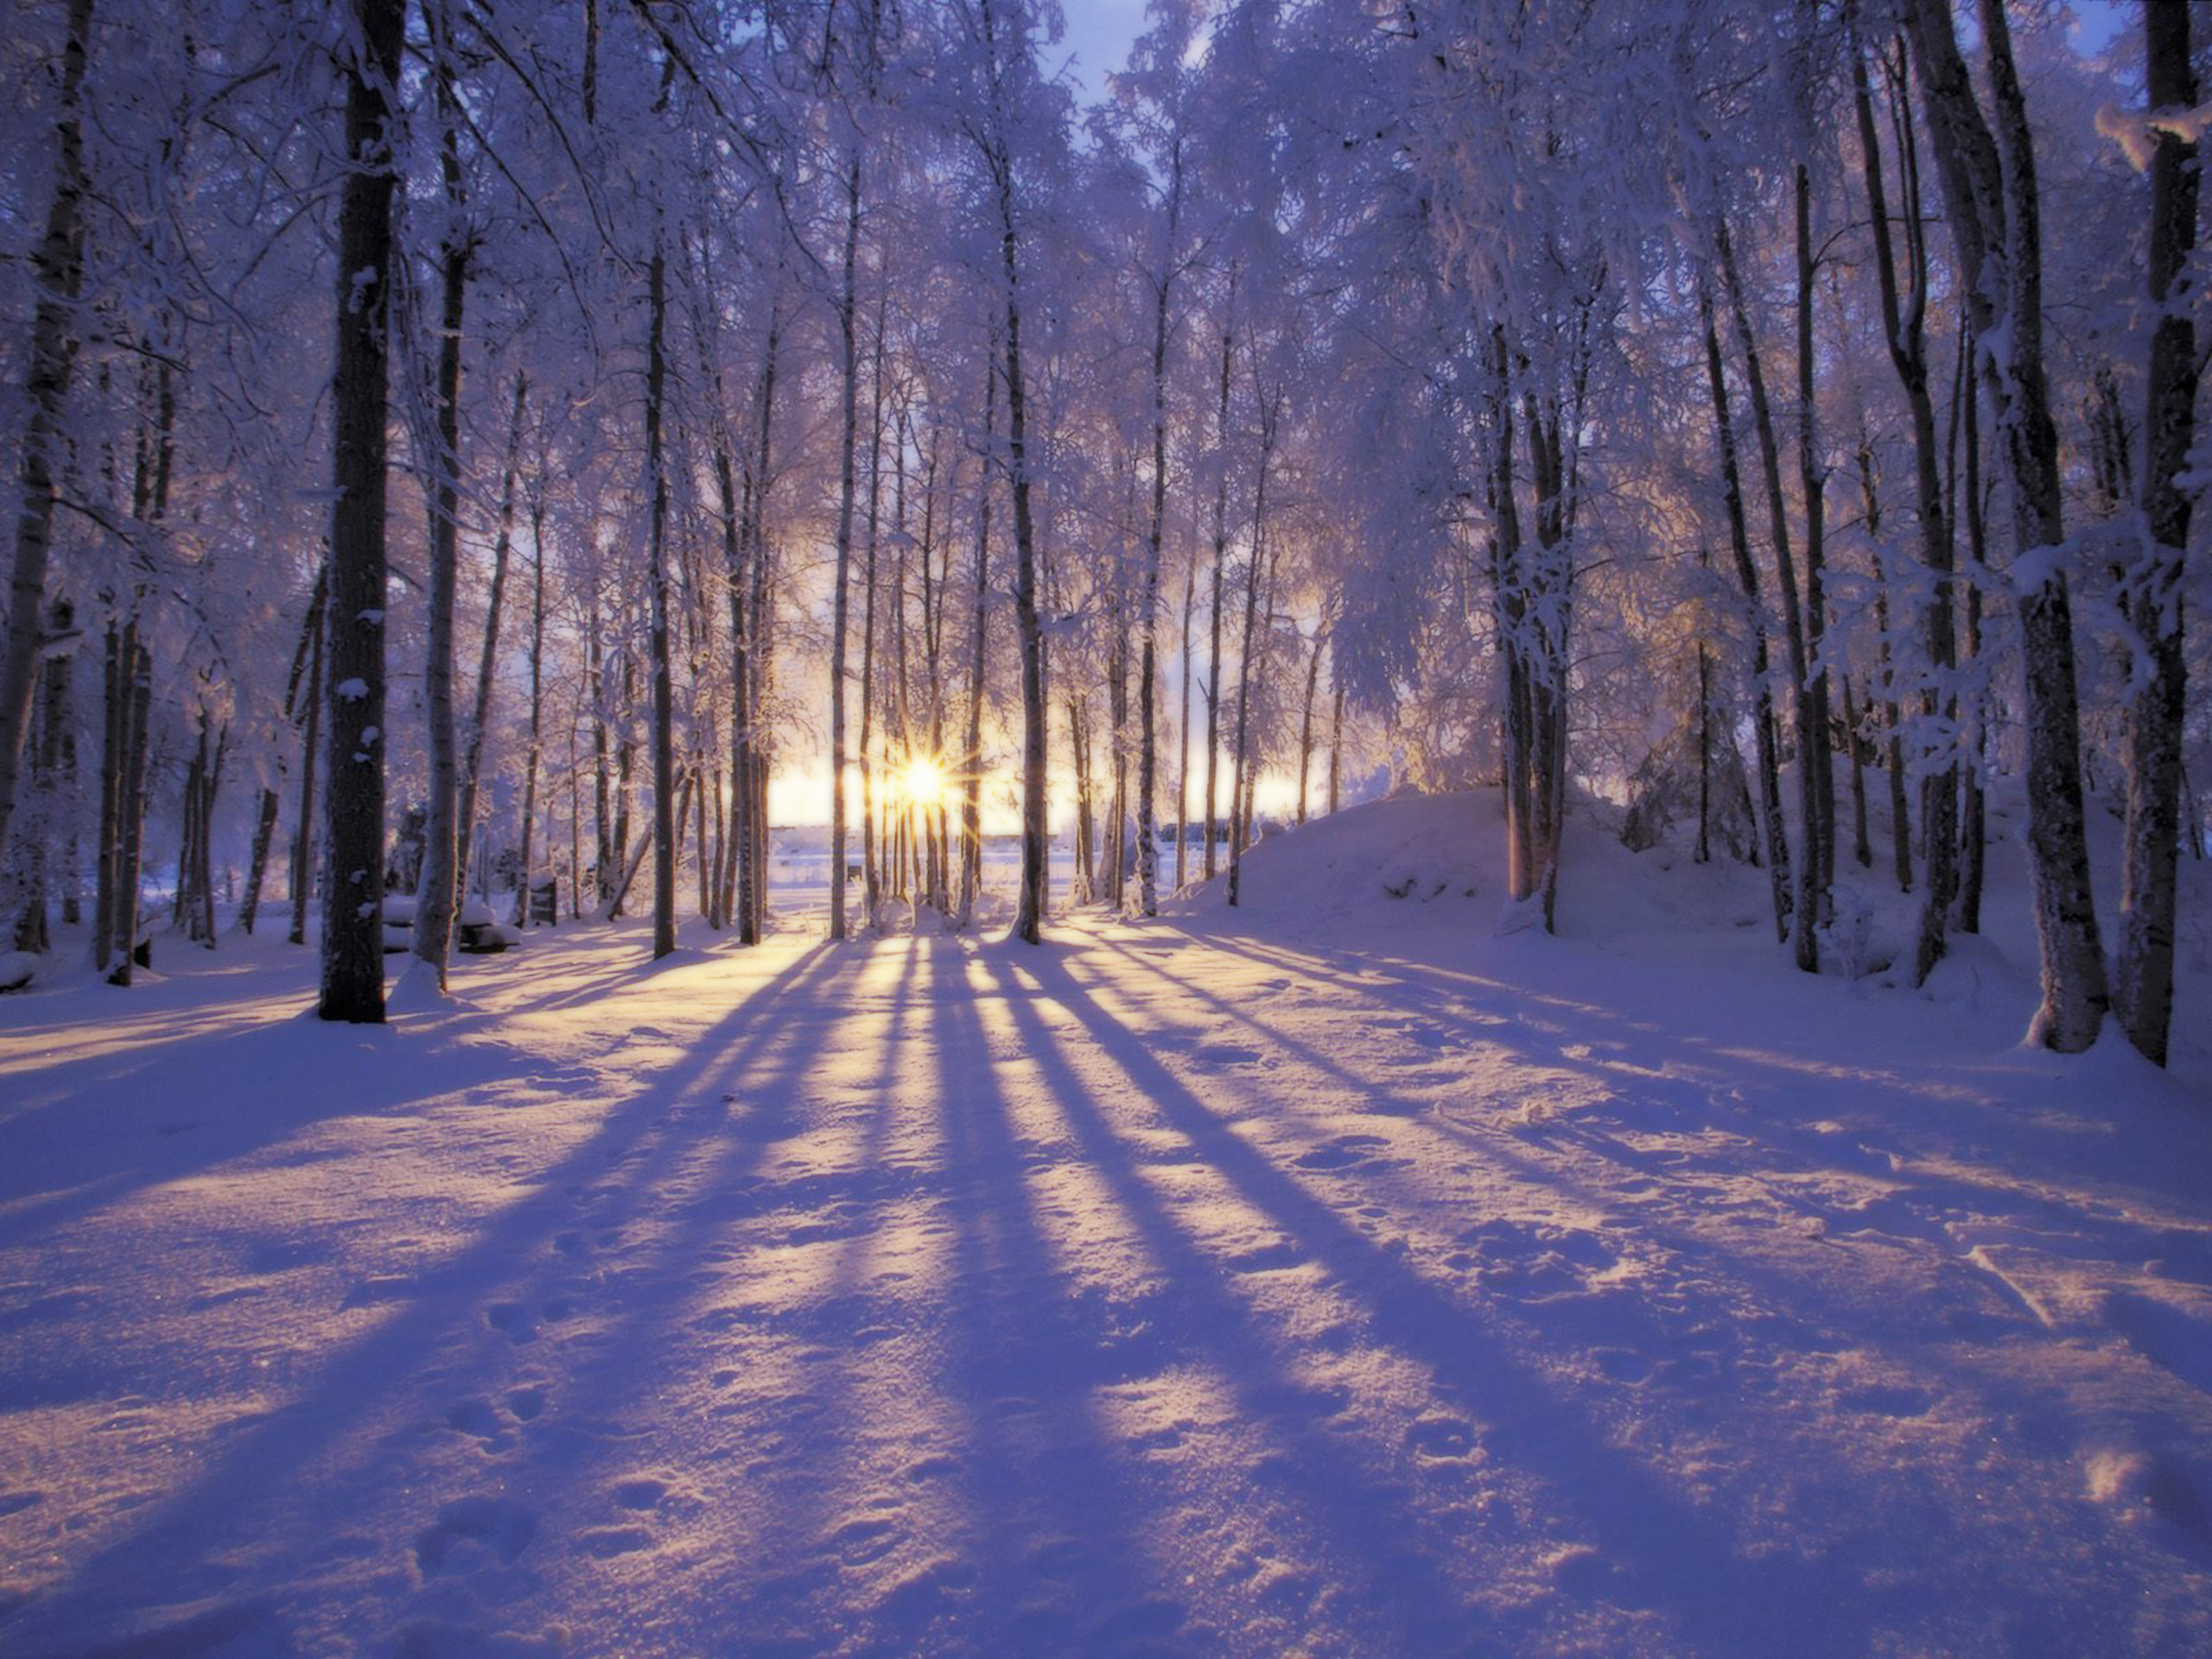 /winter-desktop-wallpaper-free-winter-desktop-wallpaper-winter